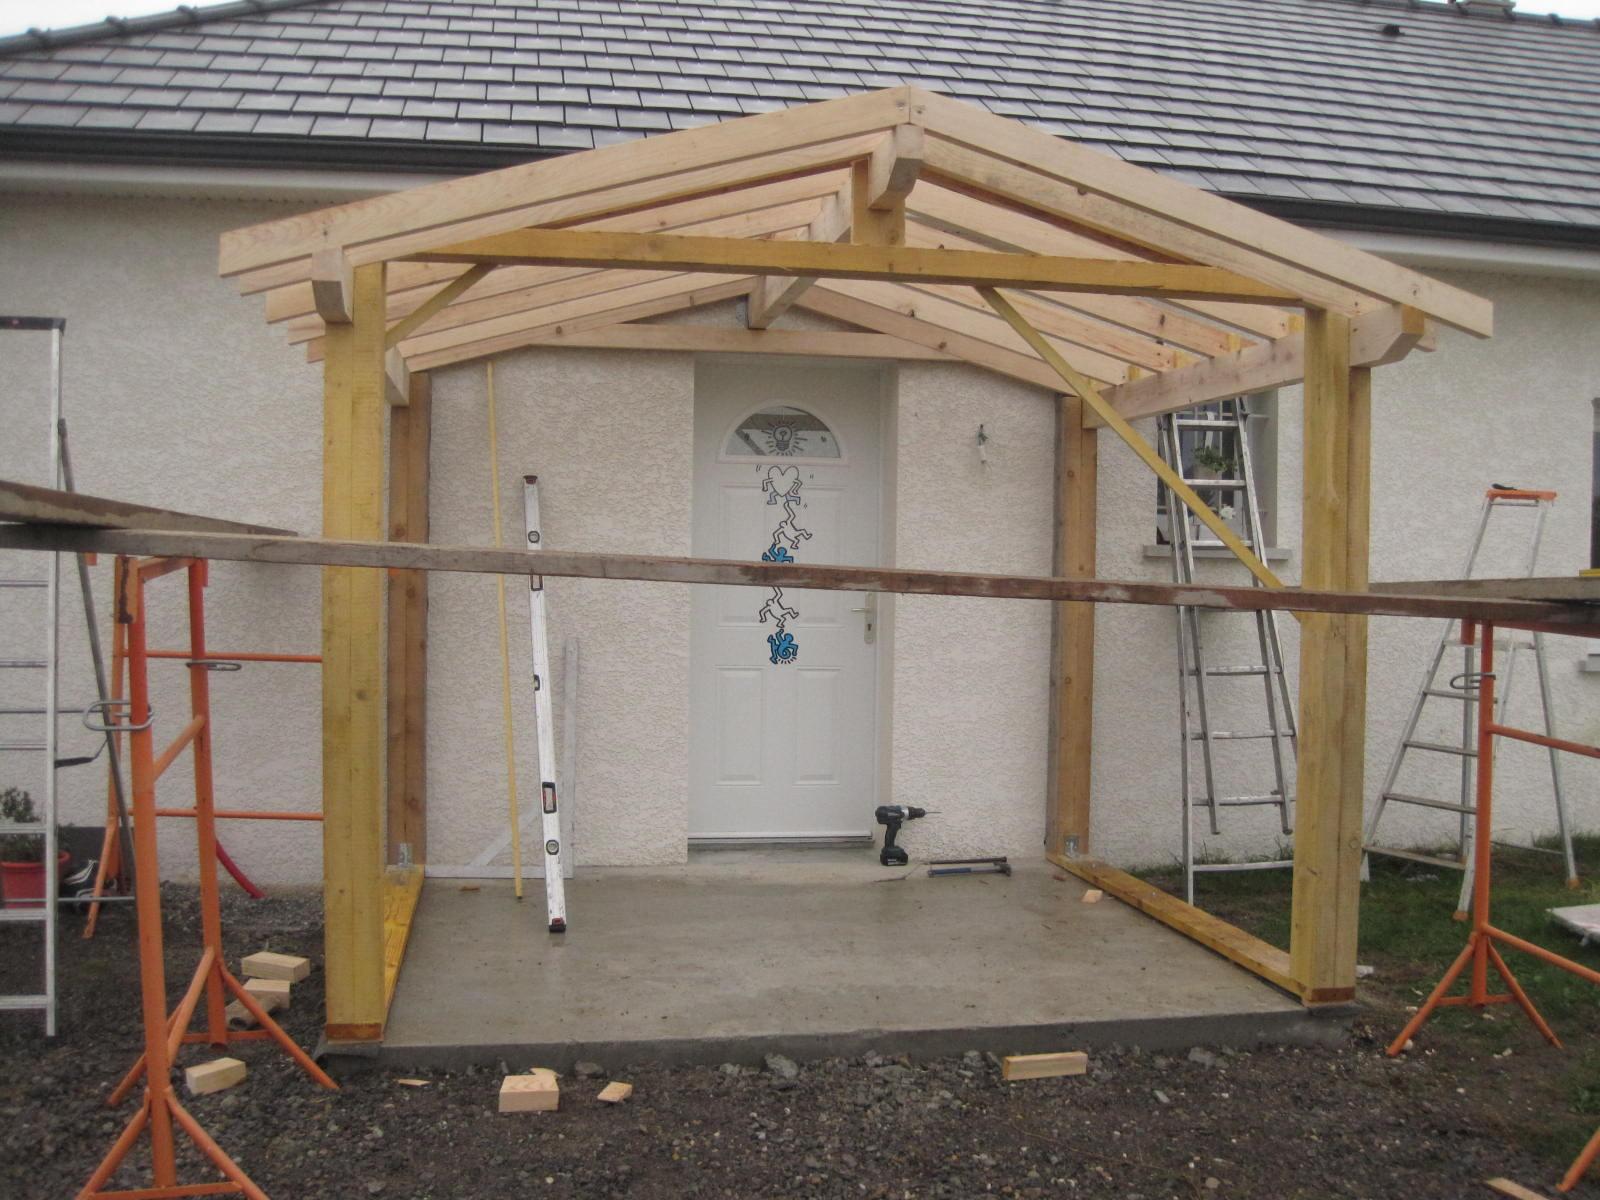 Construire Un Porche D Entrée construire un sas d entrée | idées décoration - idées décoration